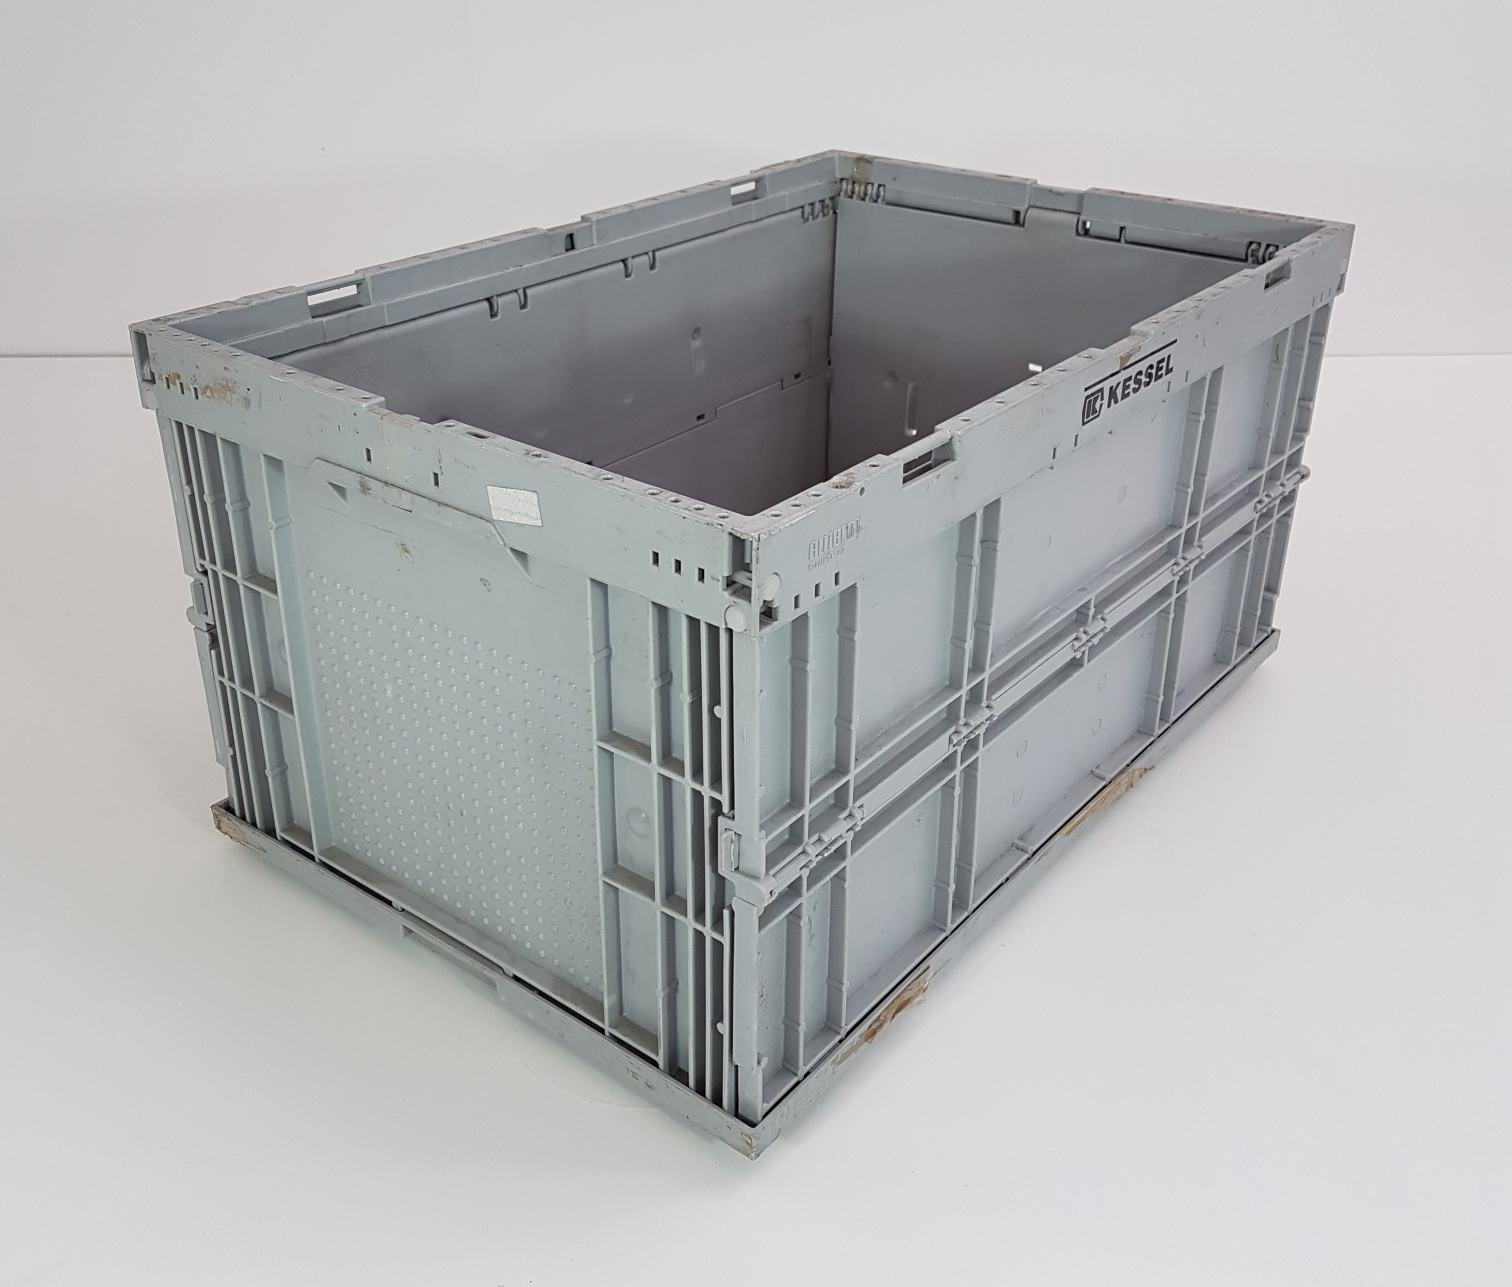 stapelboxen kunststoff elegant box multibox lagerbox kiste l with stapelboxen kunststoff. Black Bedroom Furniture Sets. Home Design Ideas